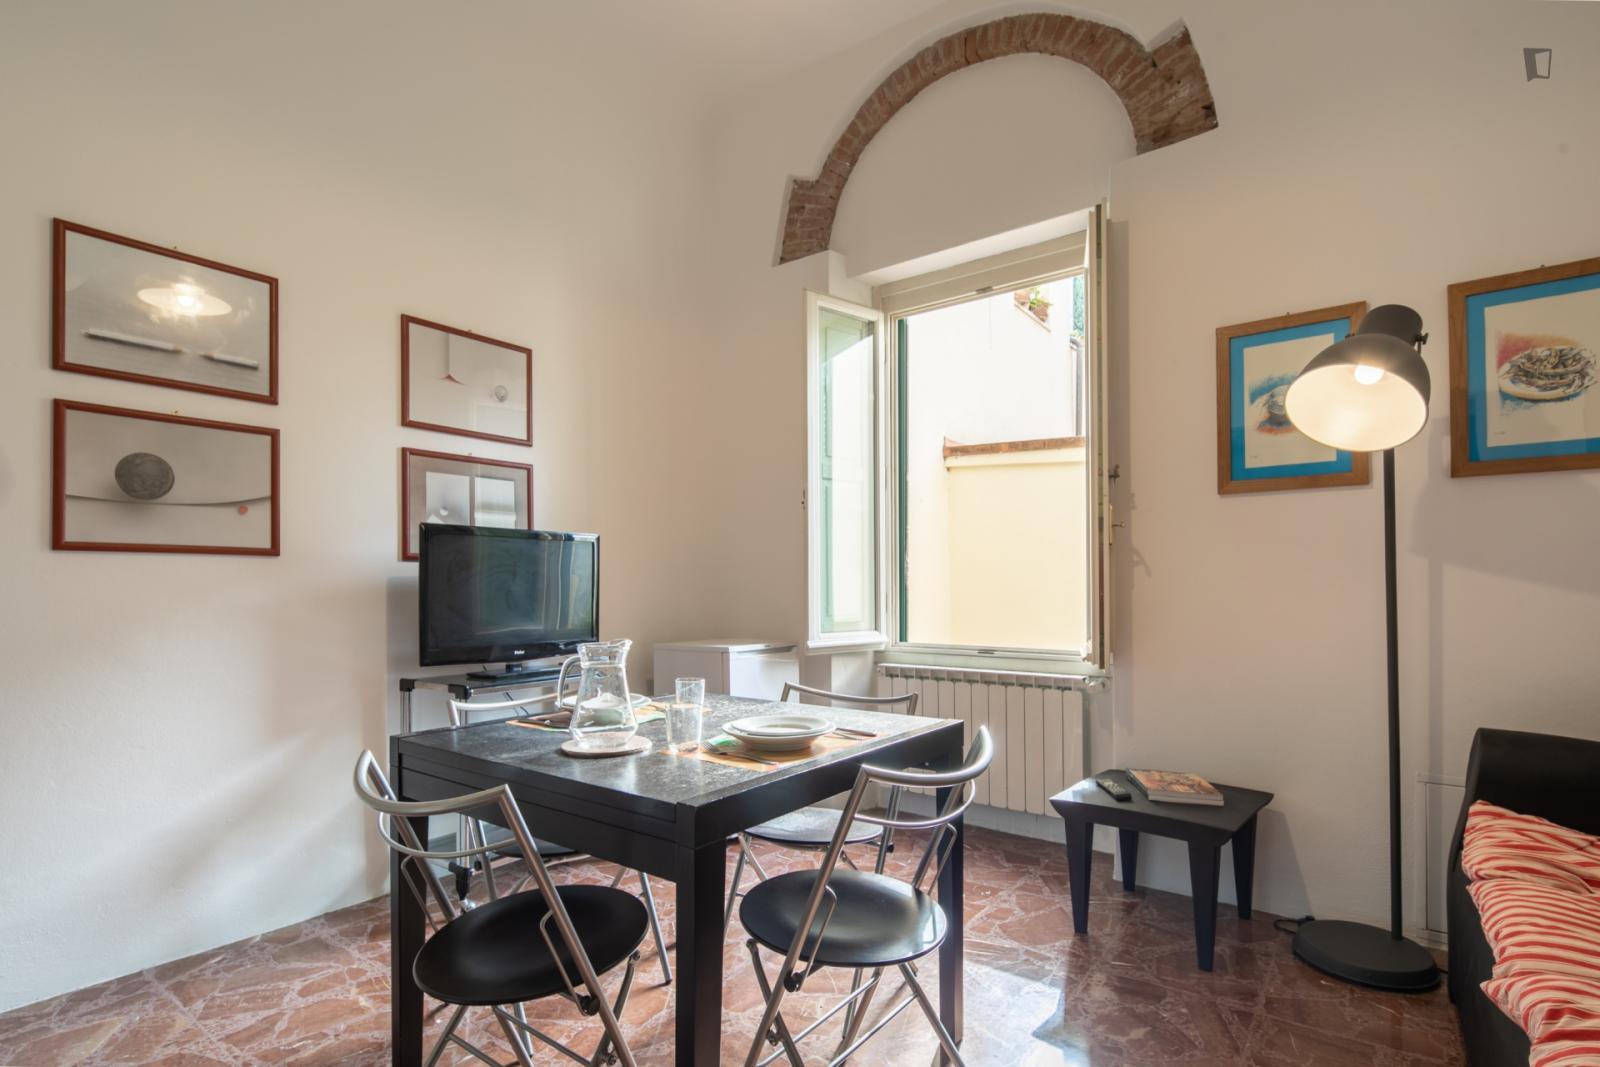 Via Fra' Giovanni Angelico - 1115EUR / month